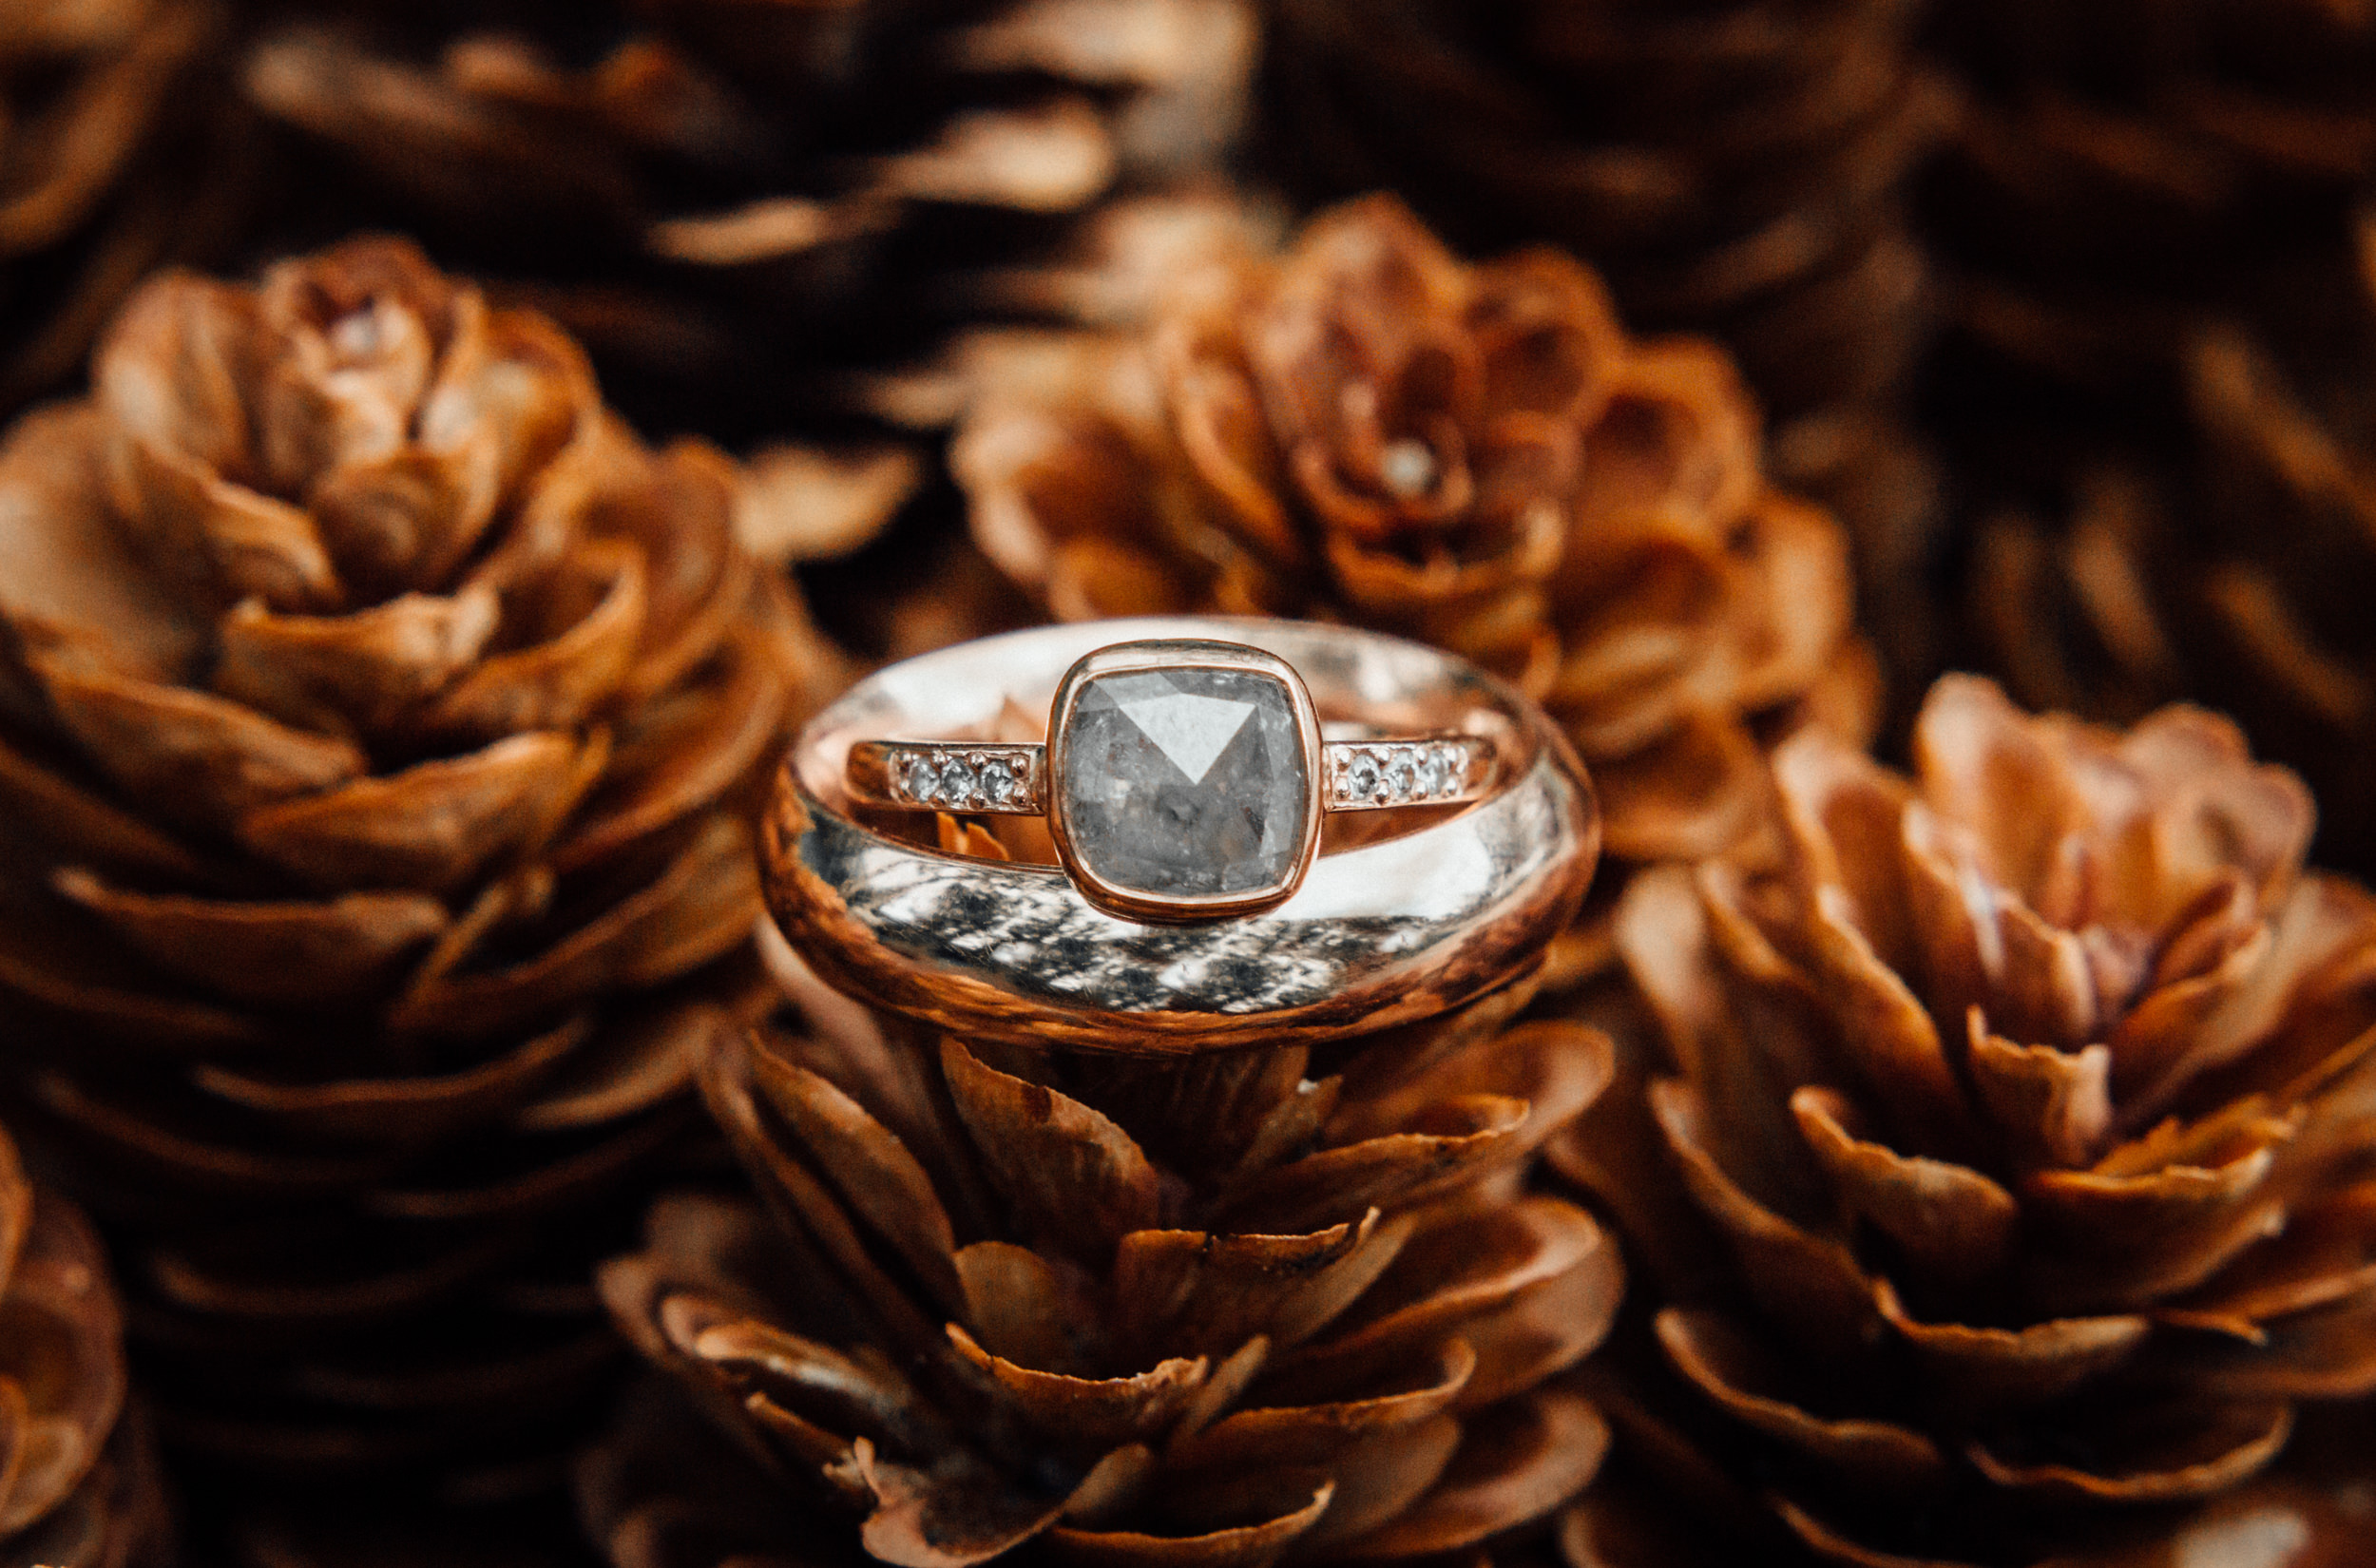 Macro ring shot in pinecones